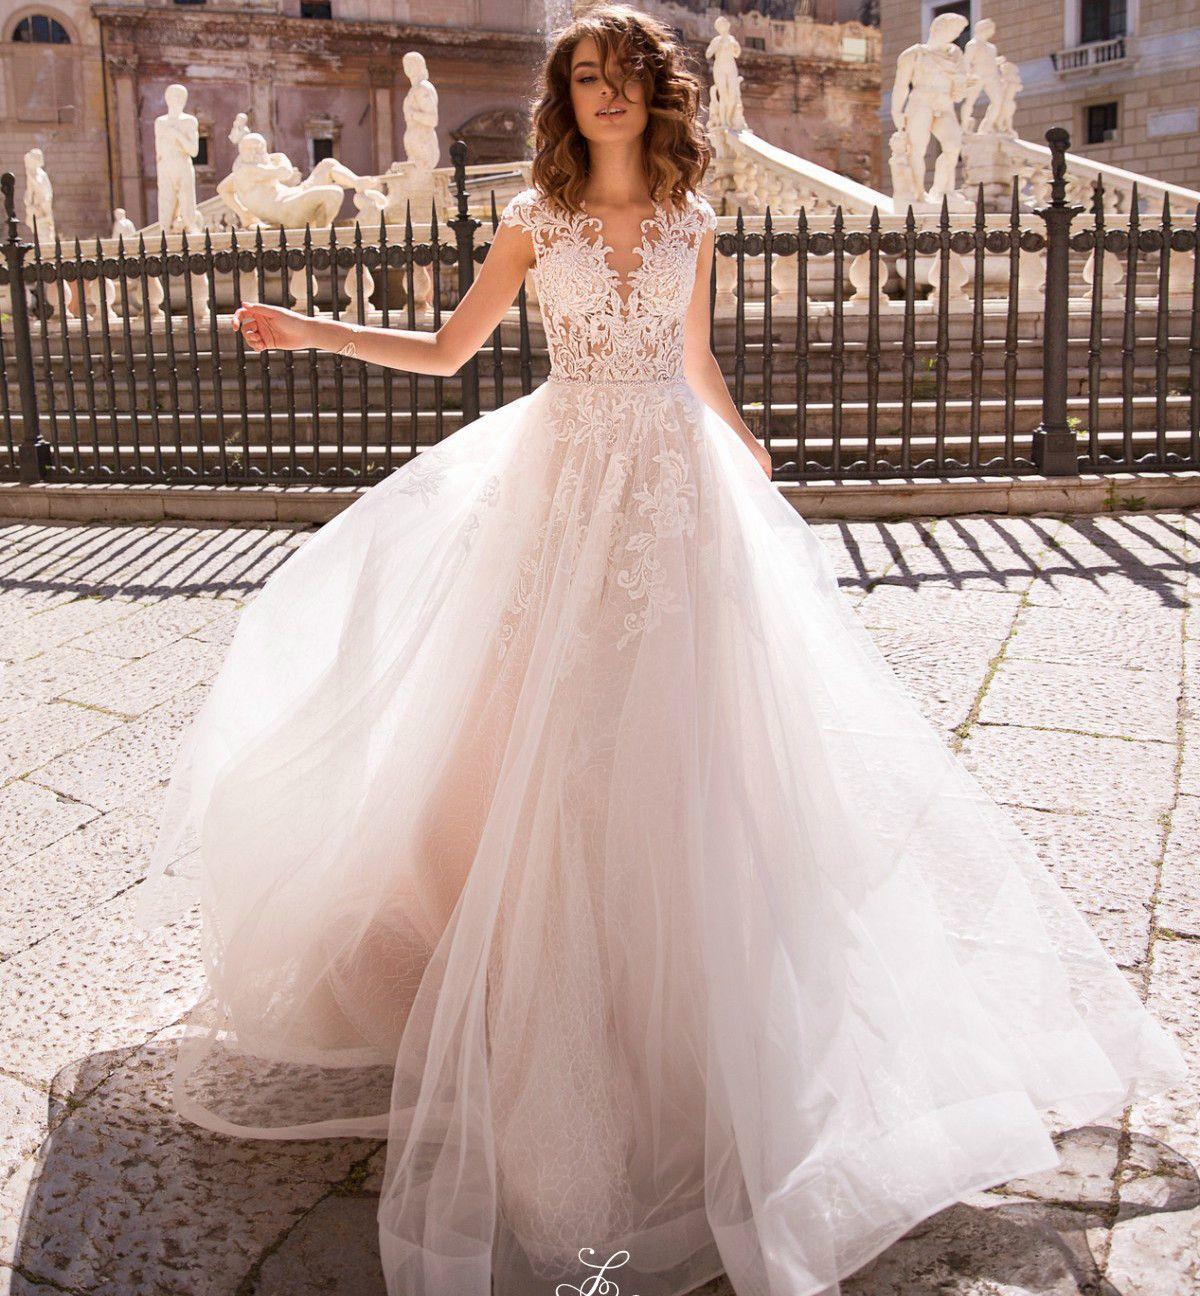 New Design Long Wedding Dress 2021 Jewel Neck Sleeveless A-Line Court Train Appliques Tulle Bridal Gowns Vestido de noiva longo